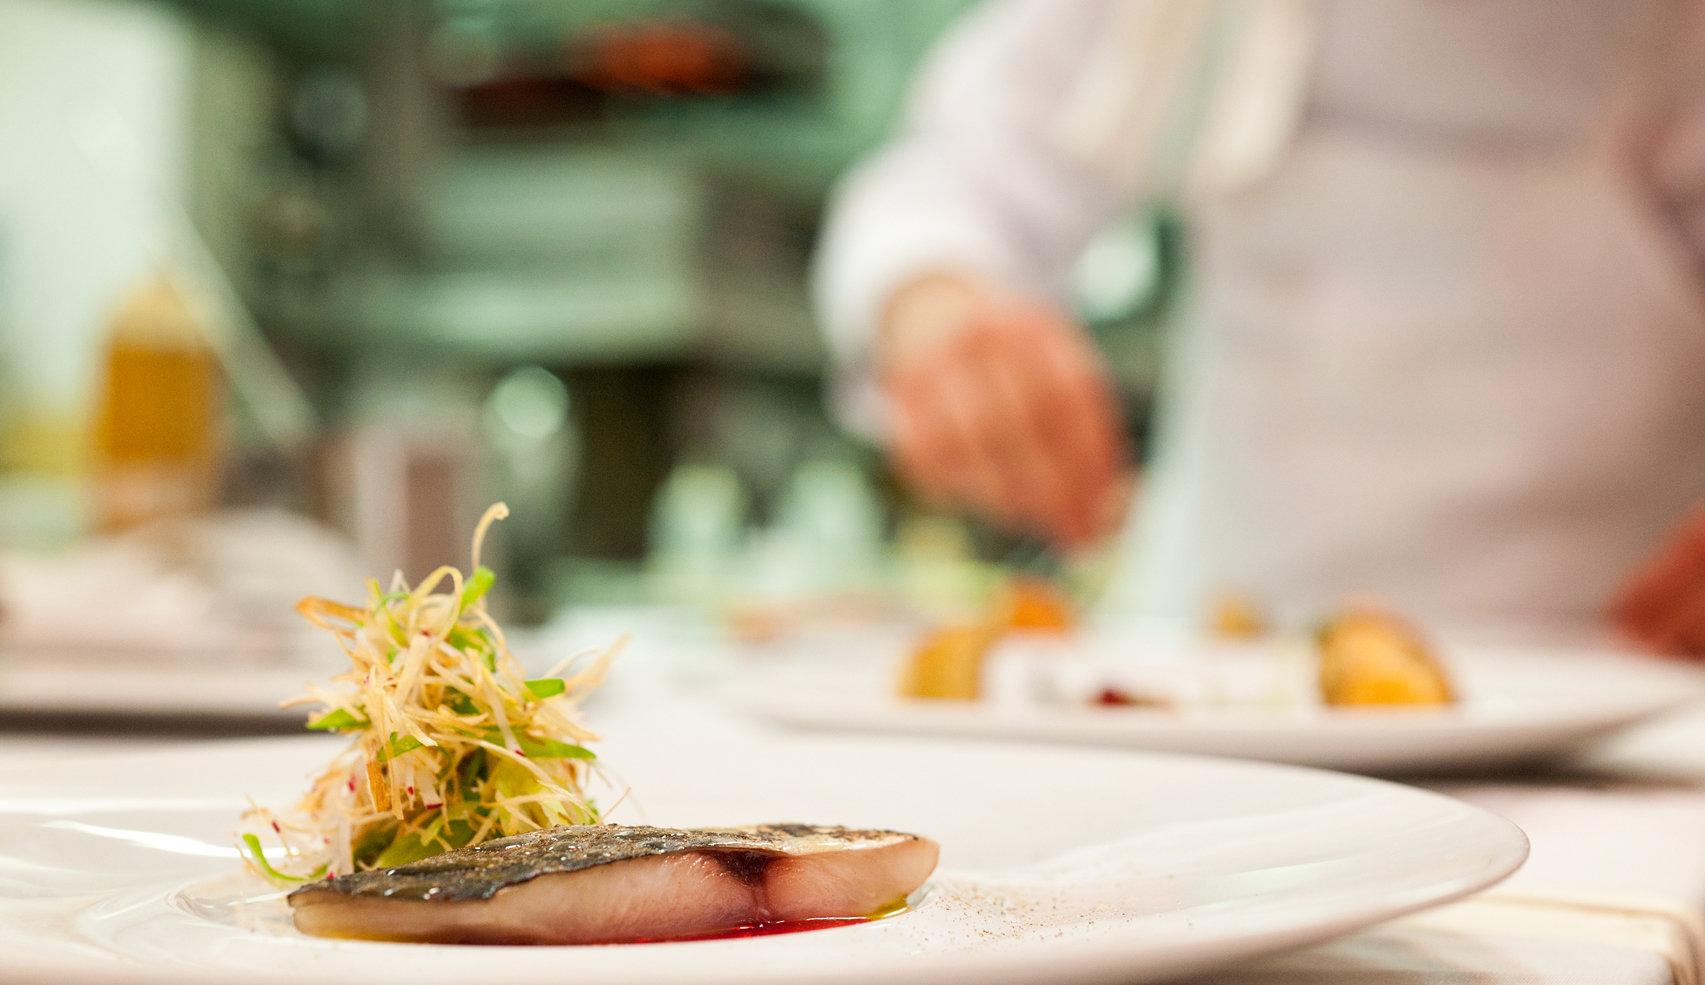 A Propos Signe Toque Action Cuisine